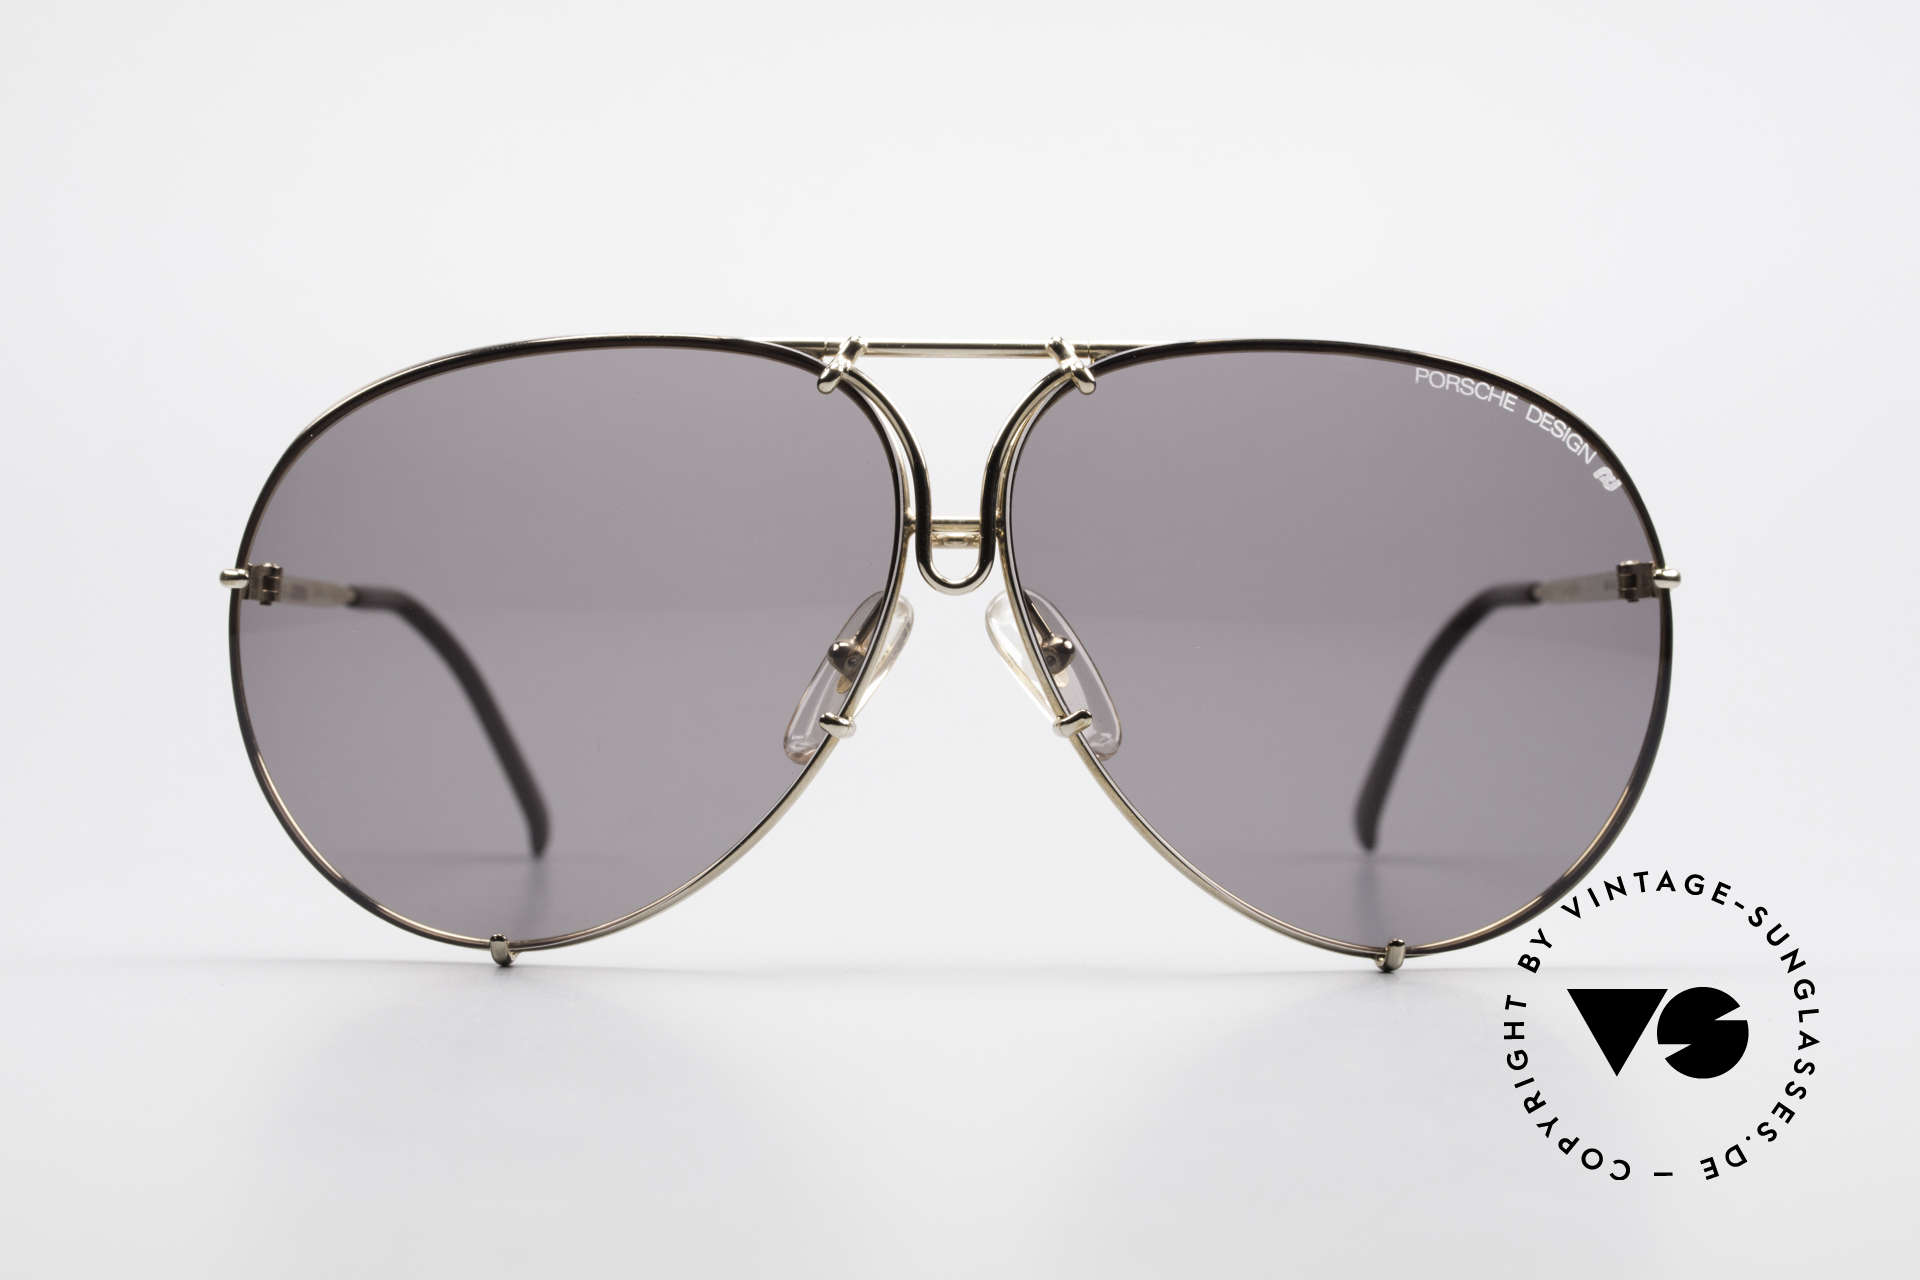 Porsche 5623 Black Mass Movie Sunglasses, unworn rarity + orig. Porsche case (collector's item), Made for Men and Women